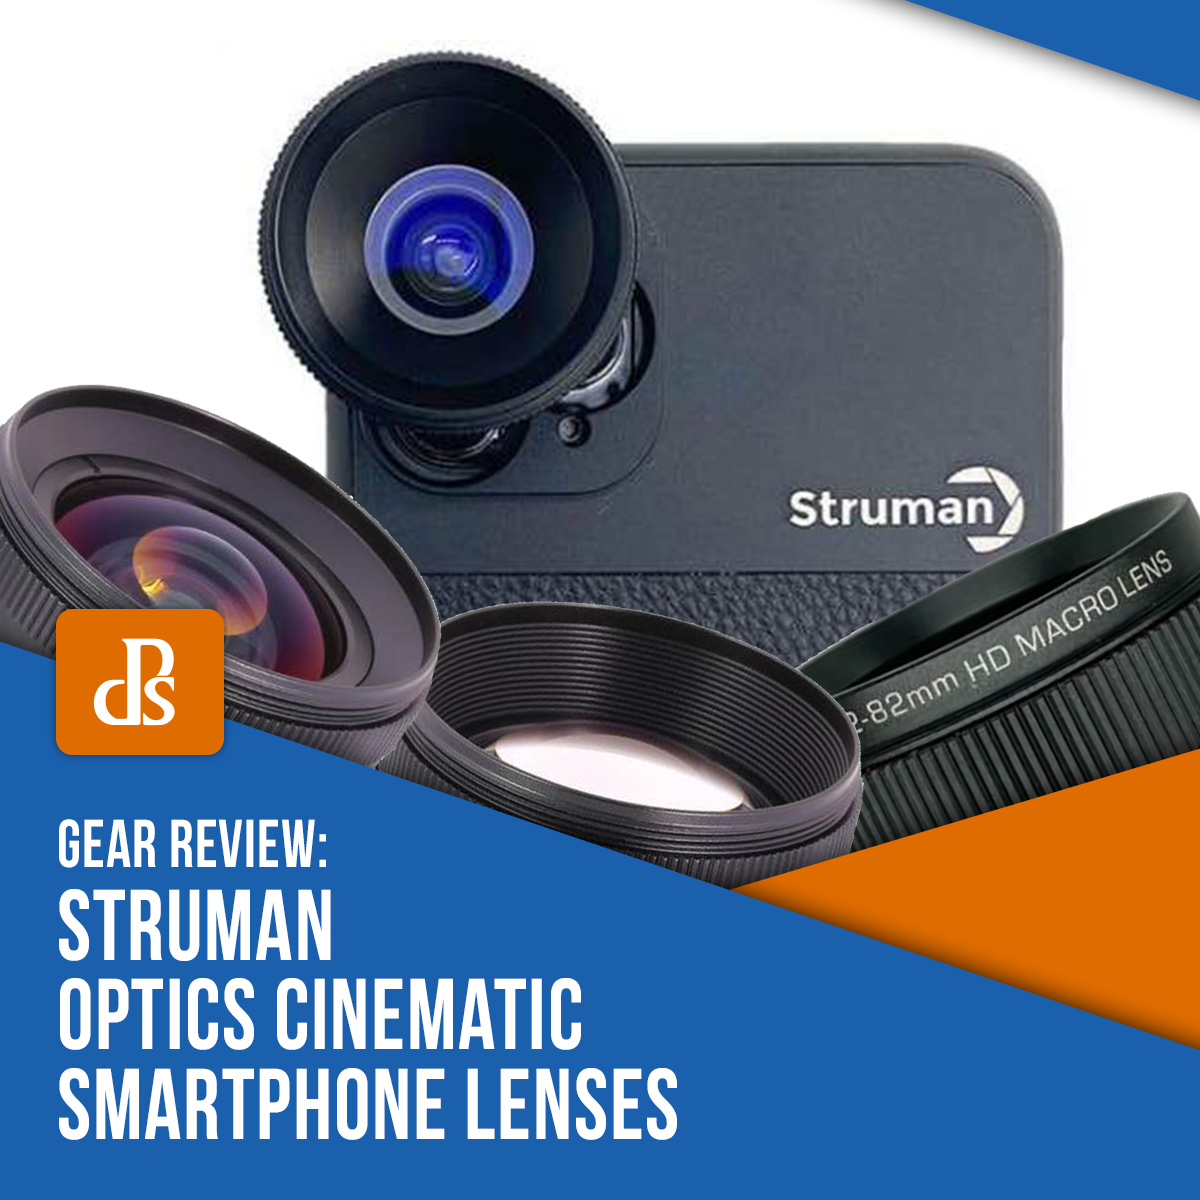 Struman Optics Cinematic lenses for smartphones review